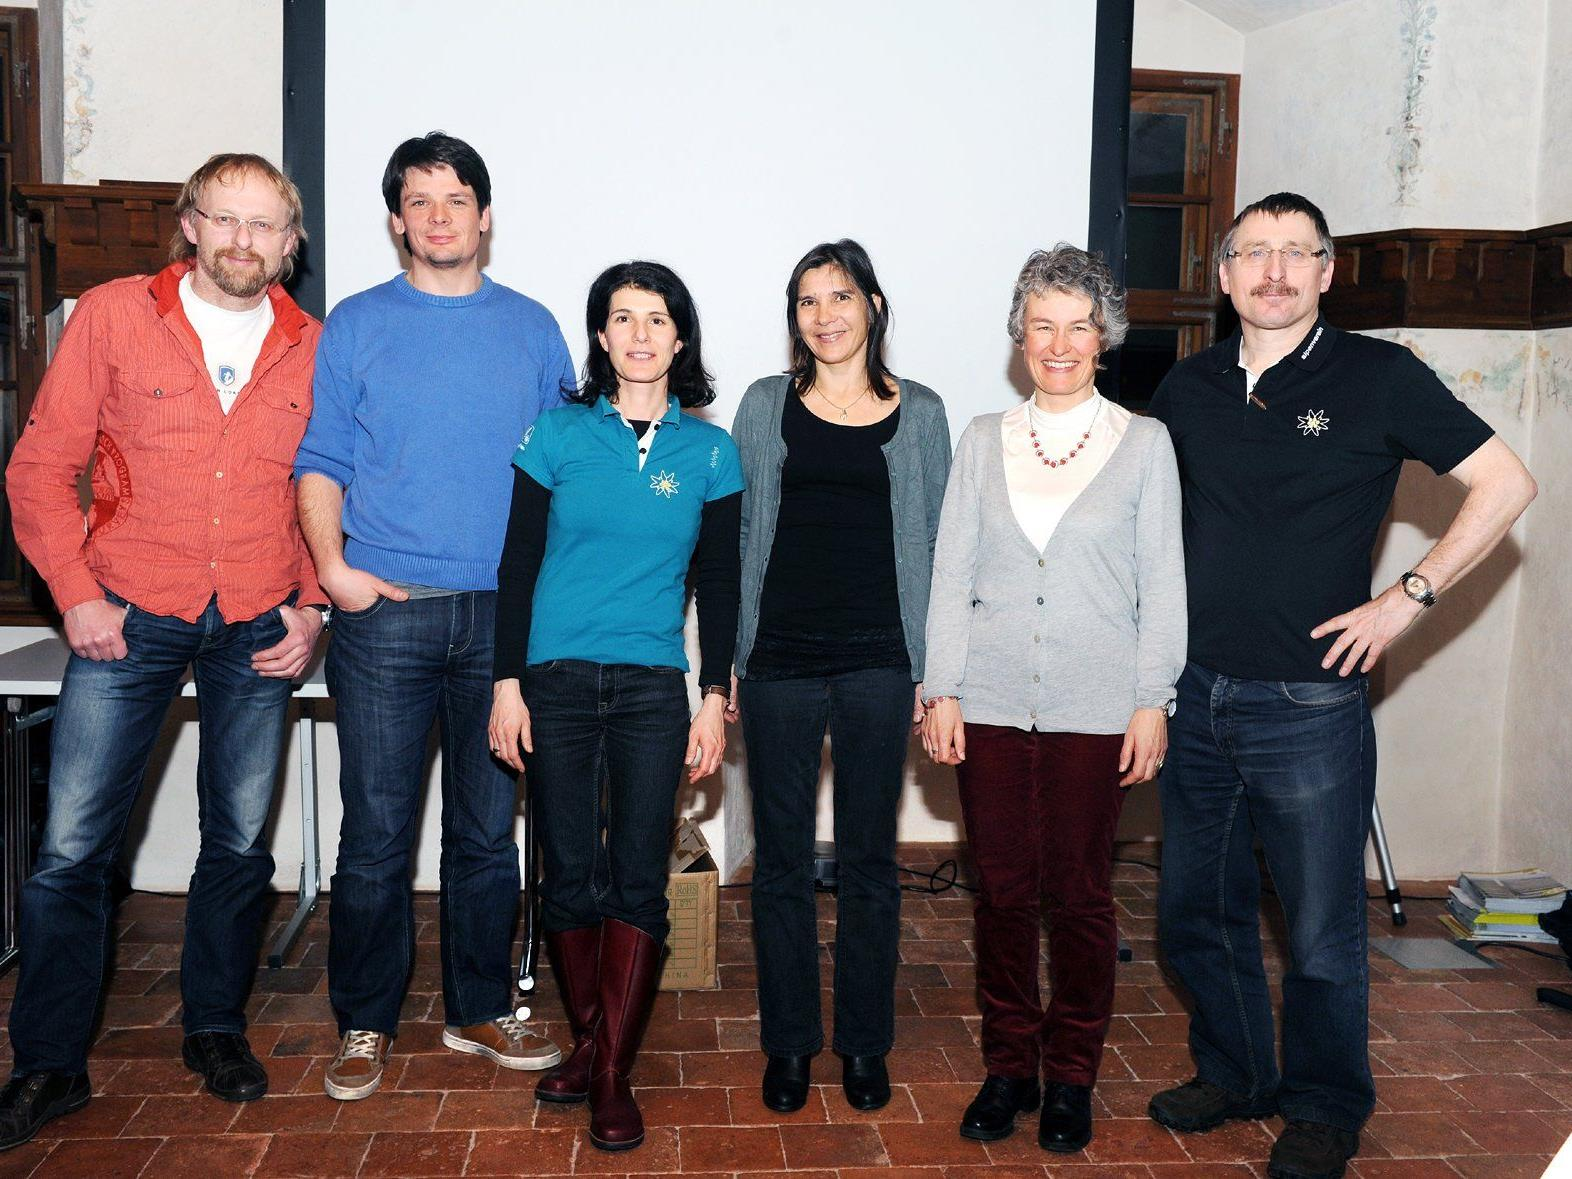 von links: Gerhard Bell, Thomas Marte, Milli Strasser-Mathis, Alida Oorburg, Christine Tabernig, Horst Huber